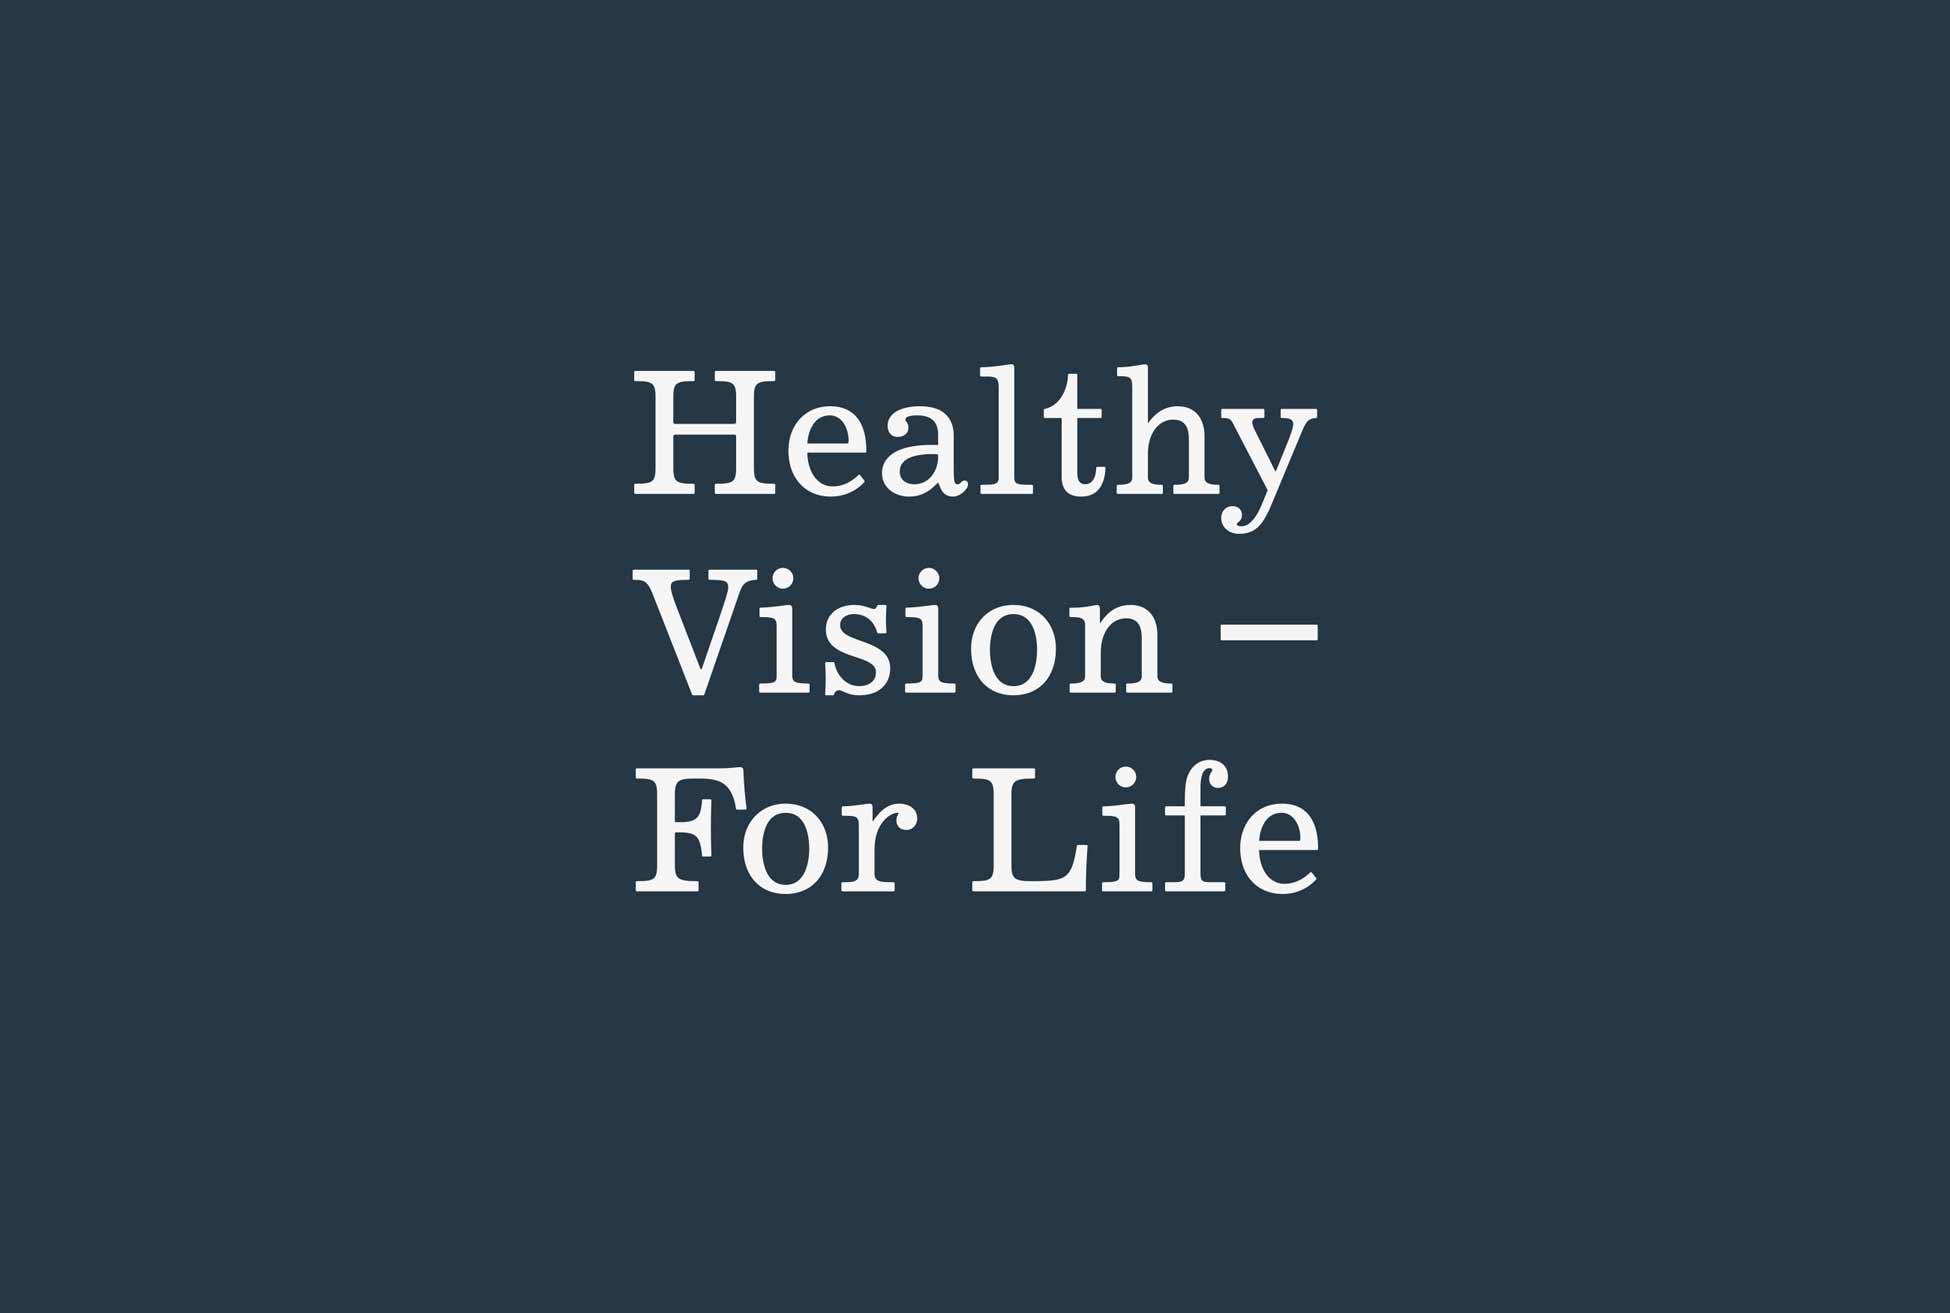 eyetoeye_healthy-vision-for-life.jpg